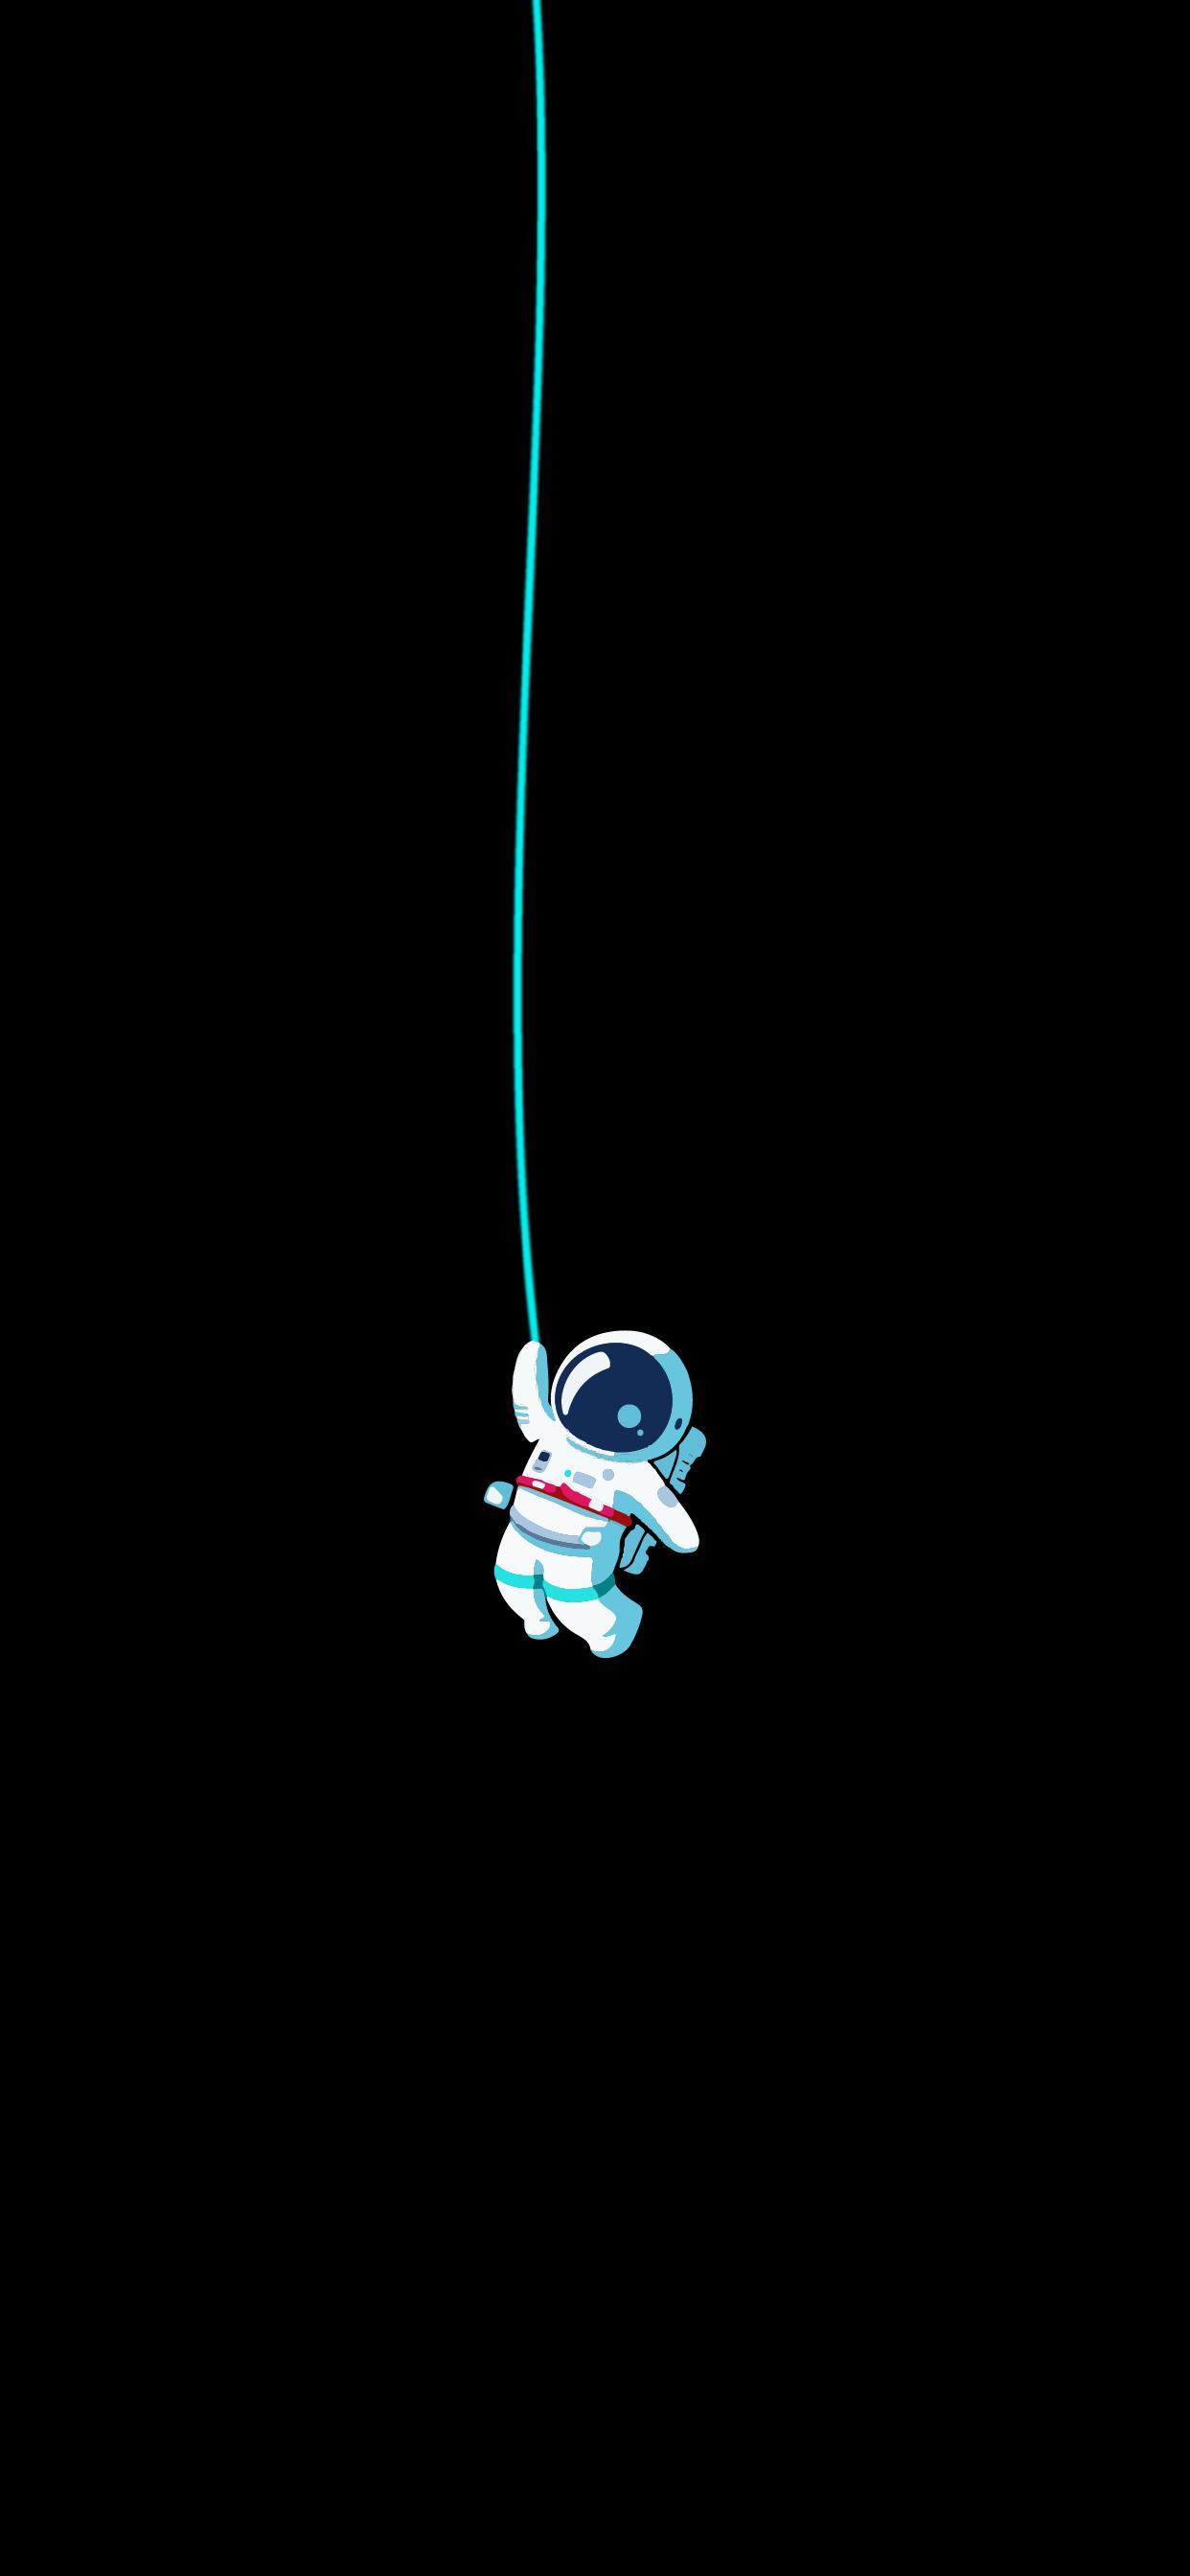 astronaut in space lock screen